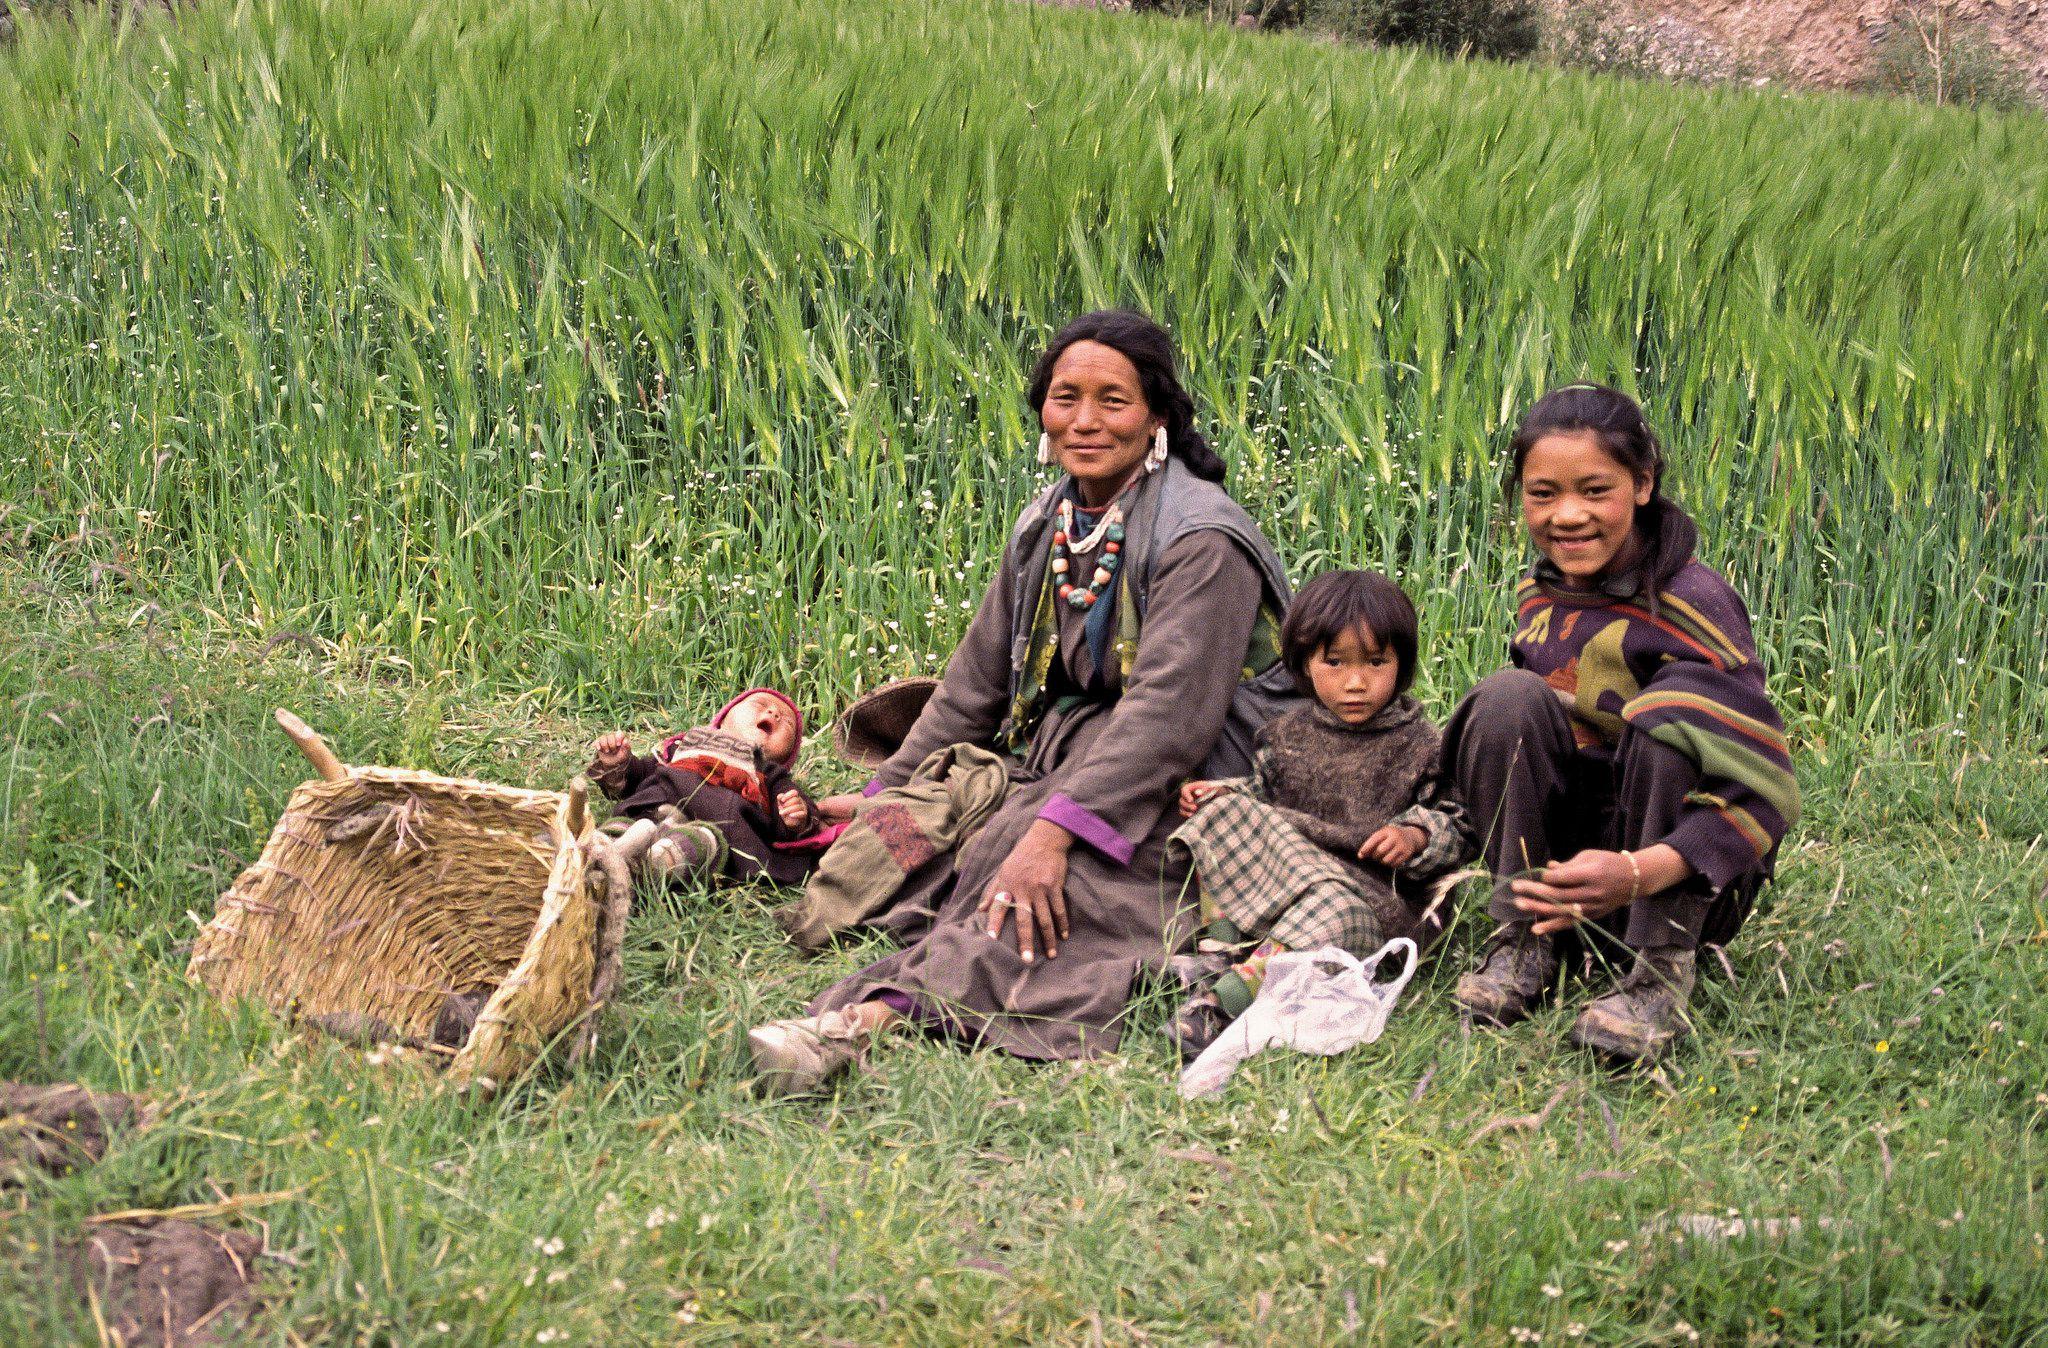 https://flic.kr/p/CgxNyU |  Ladakh -Famille au champ